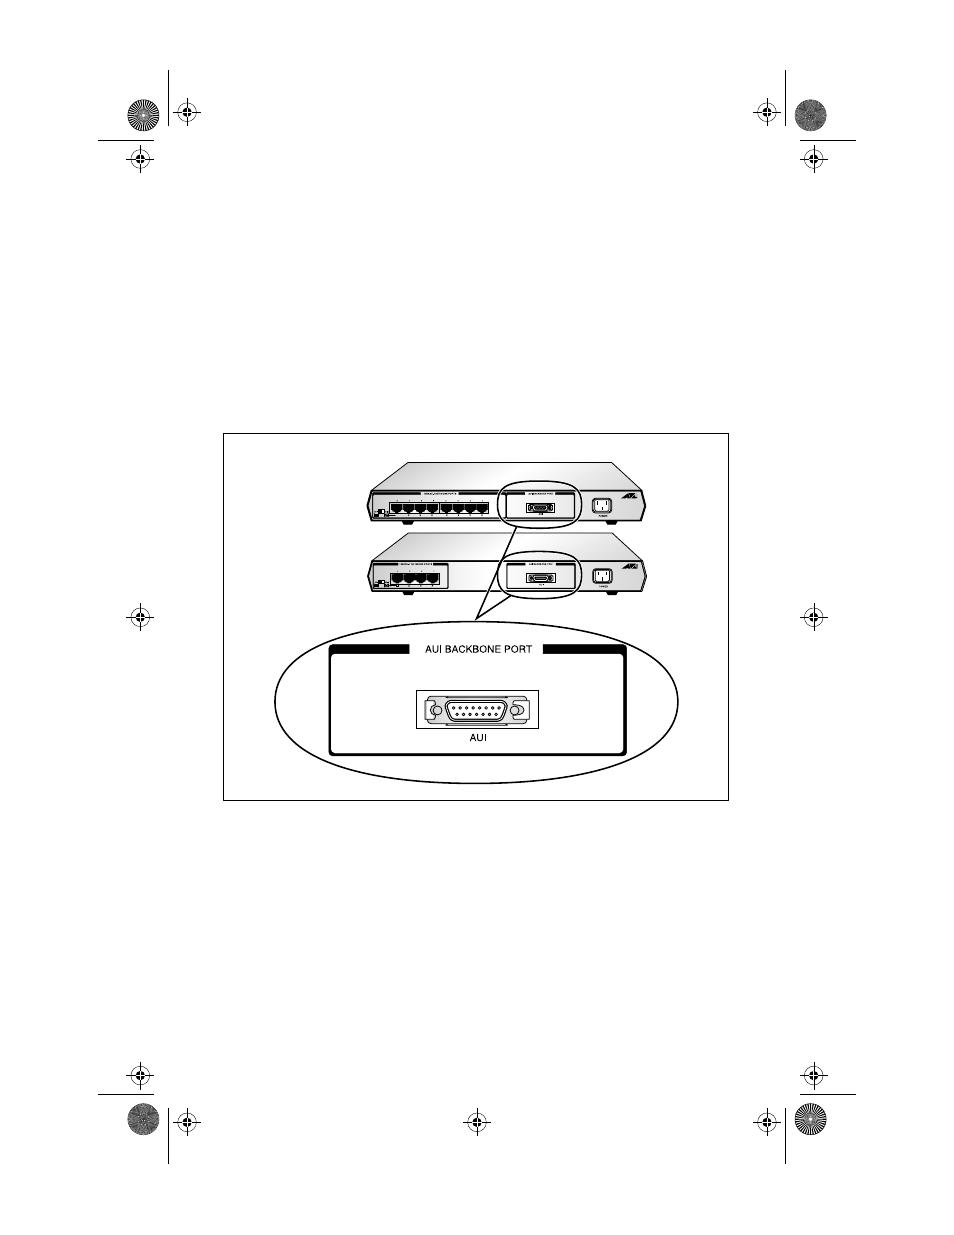 Jabber lock-up protection, Backbone network port, Figure 3